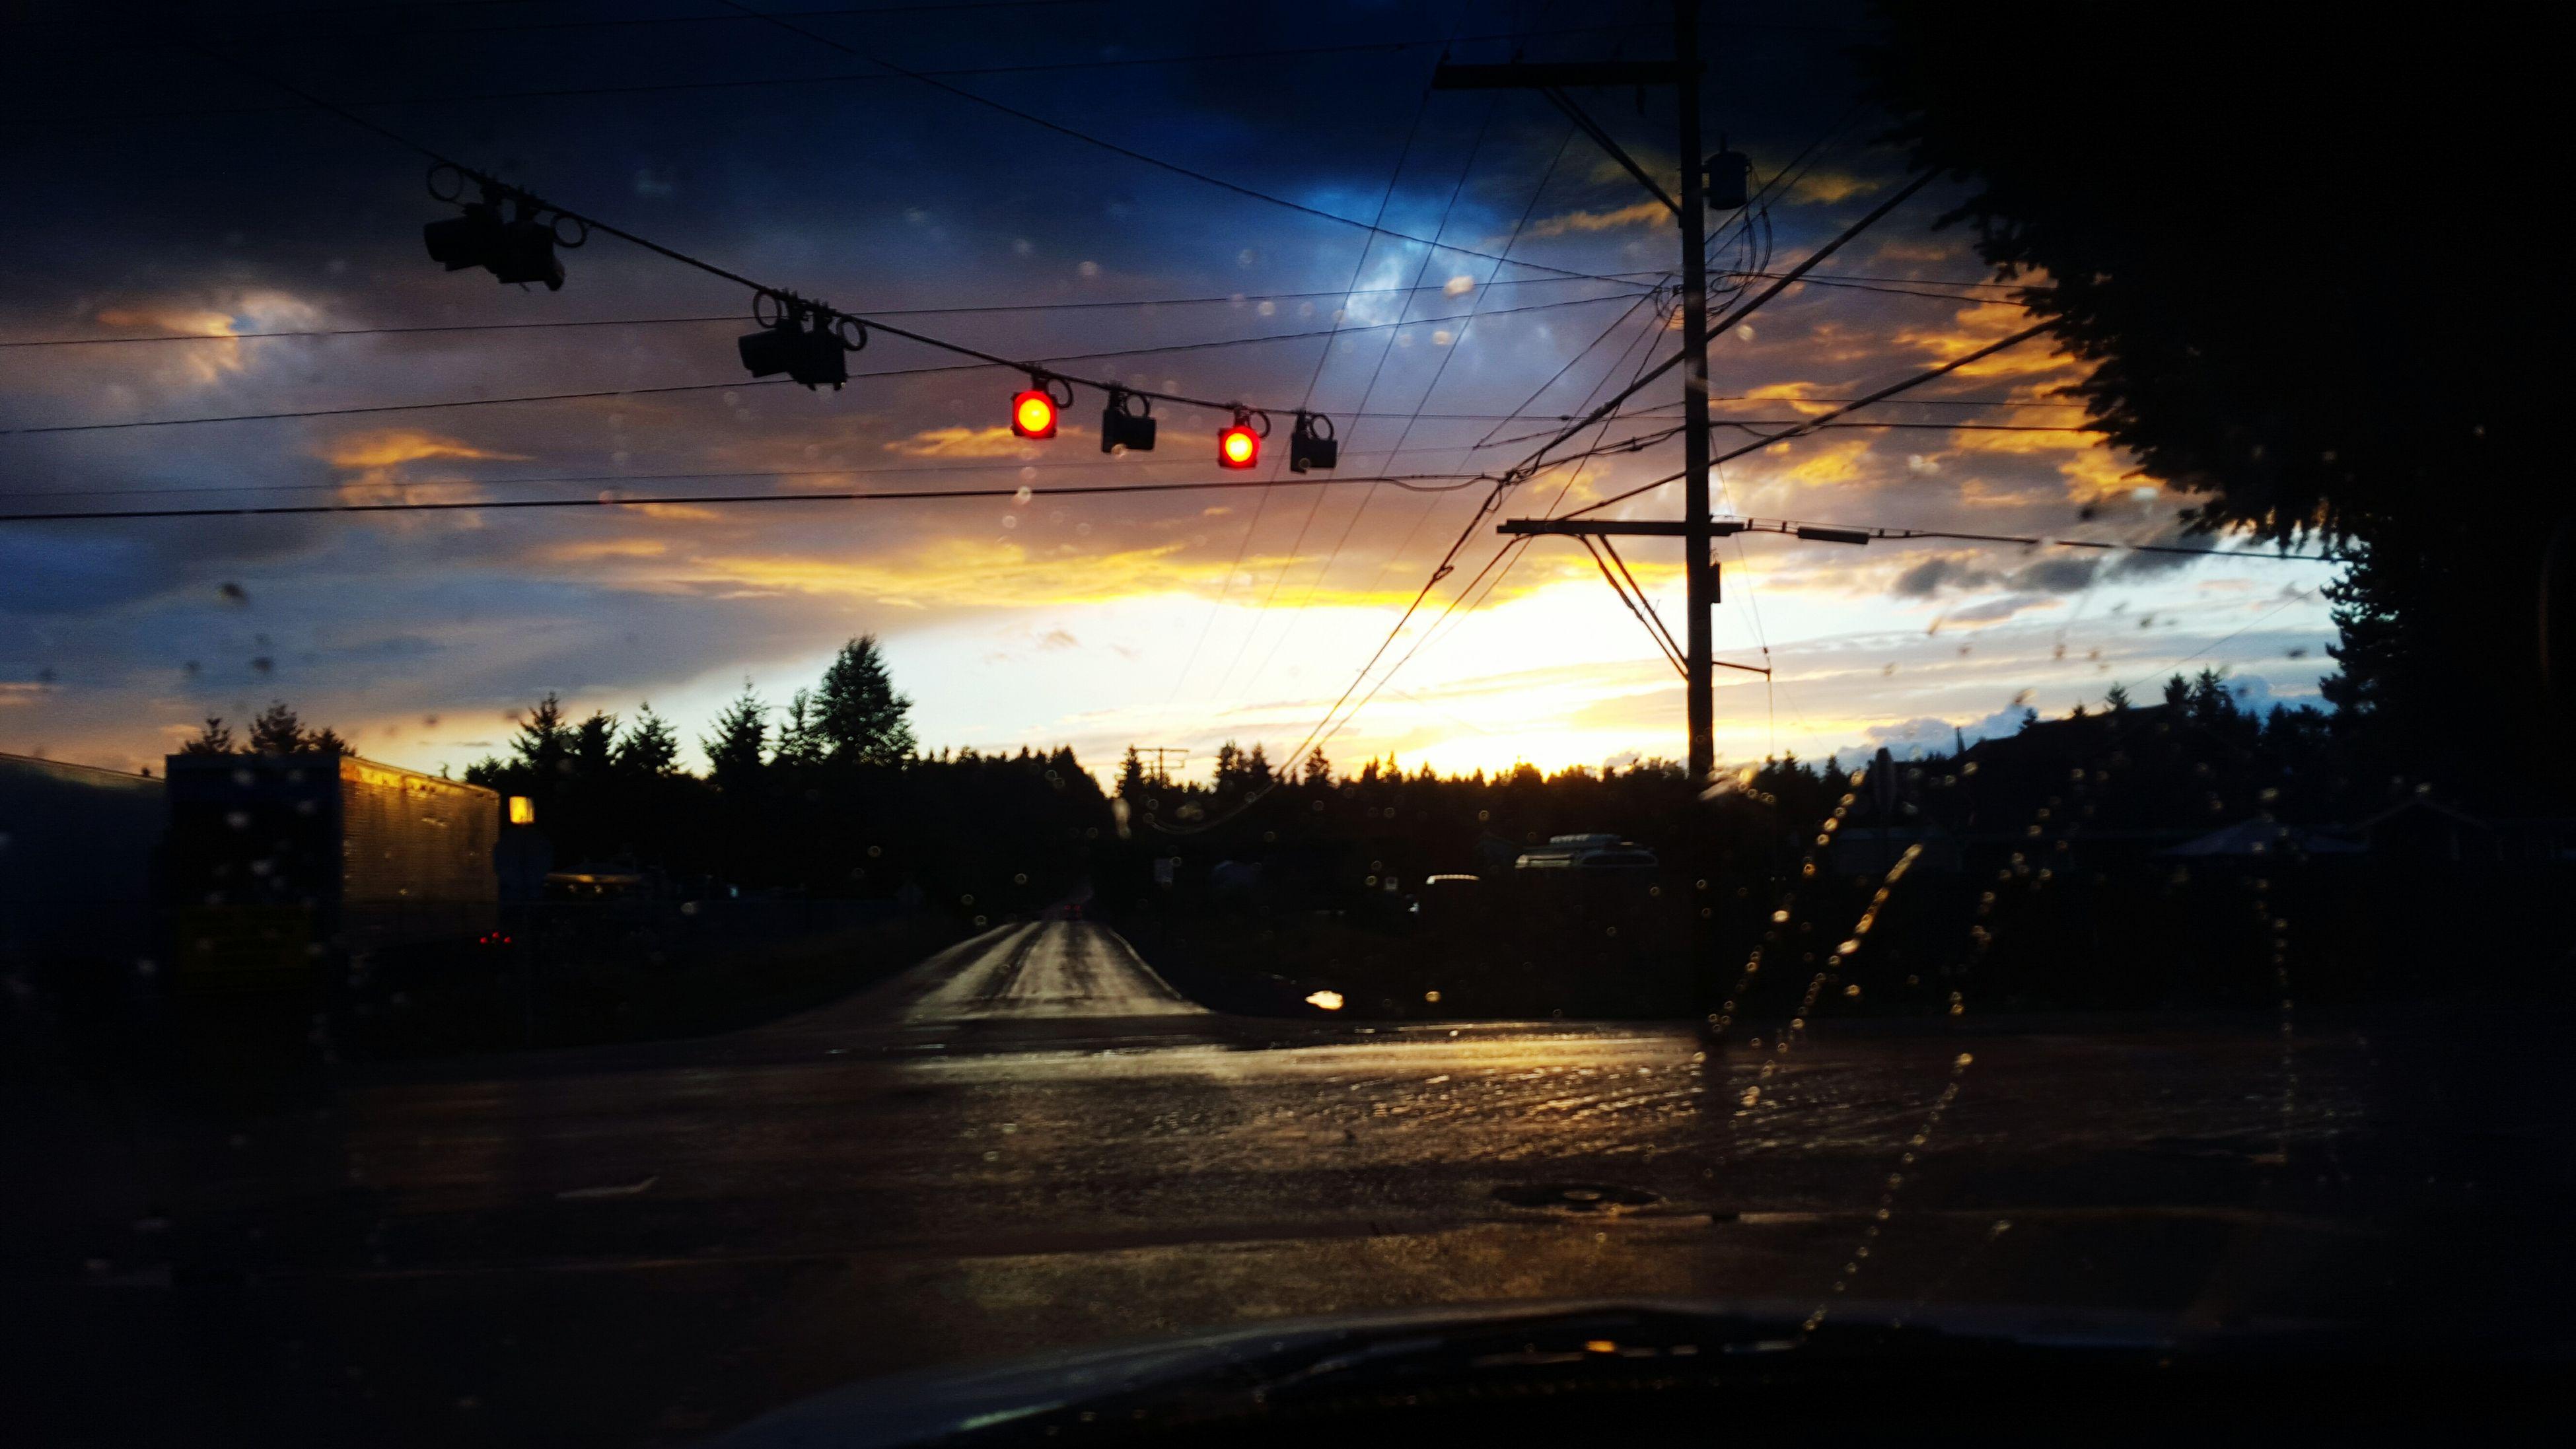 sunset, sky, transportation, silhouette, cloud - sky, power line, electricity pylon, car, land vehicle, road, mode of transport, dusk, tree, power supply, street, electricity, orange color, cloudy, cloud, street light